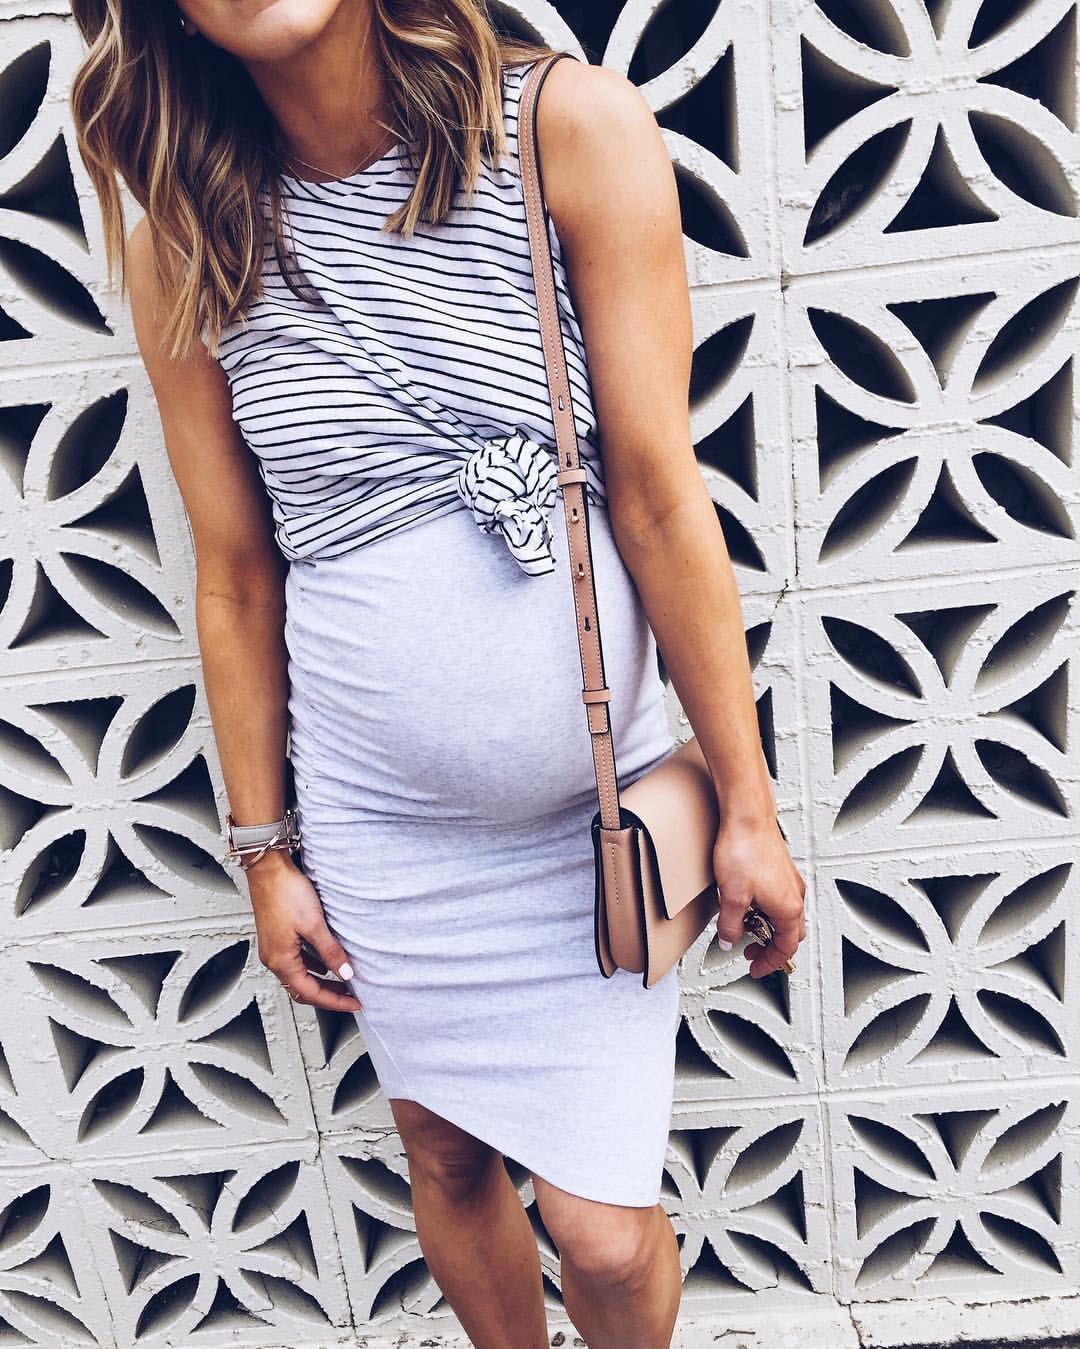 Zwangerschapskleding 46.Pin By Cheyenne Kuder On Fashion Pinterest Zwangerschapskleding